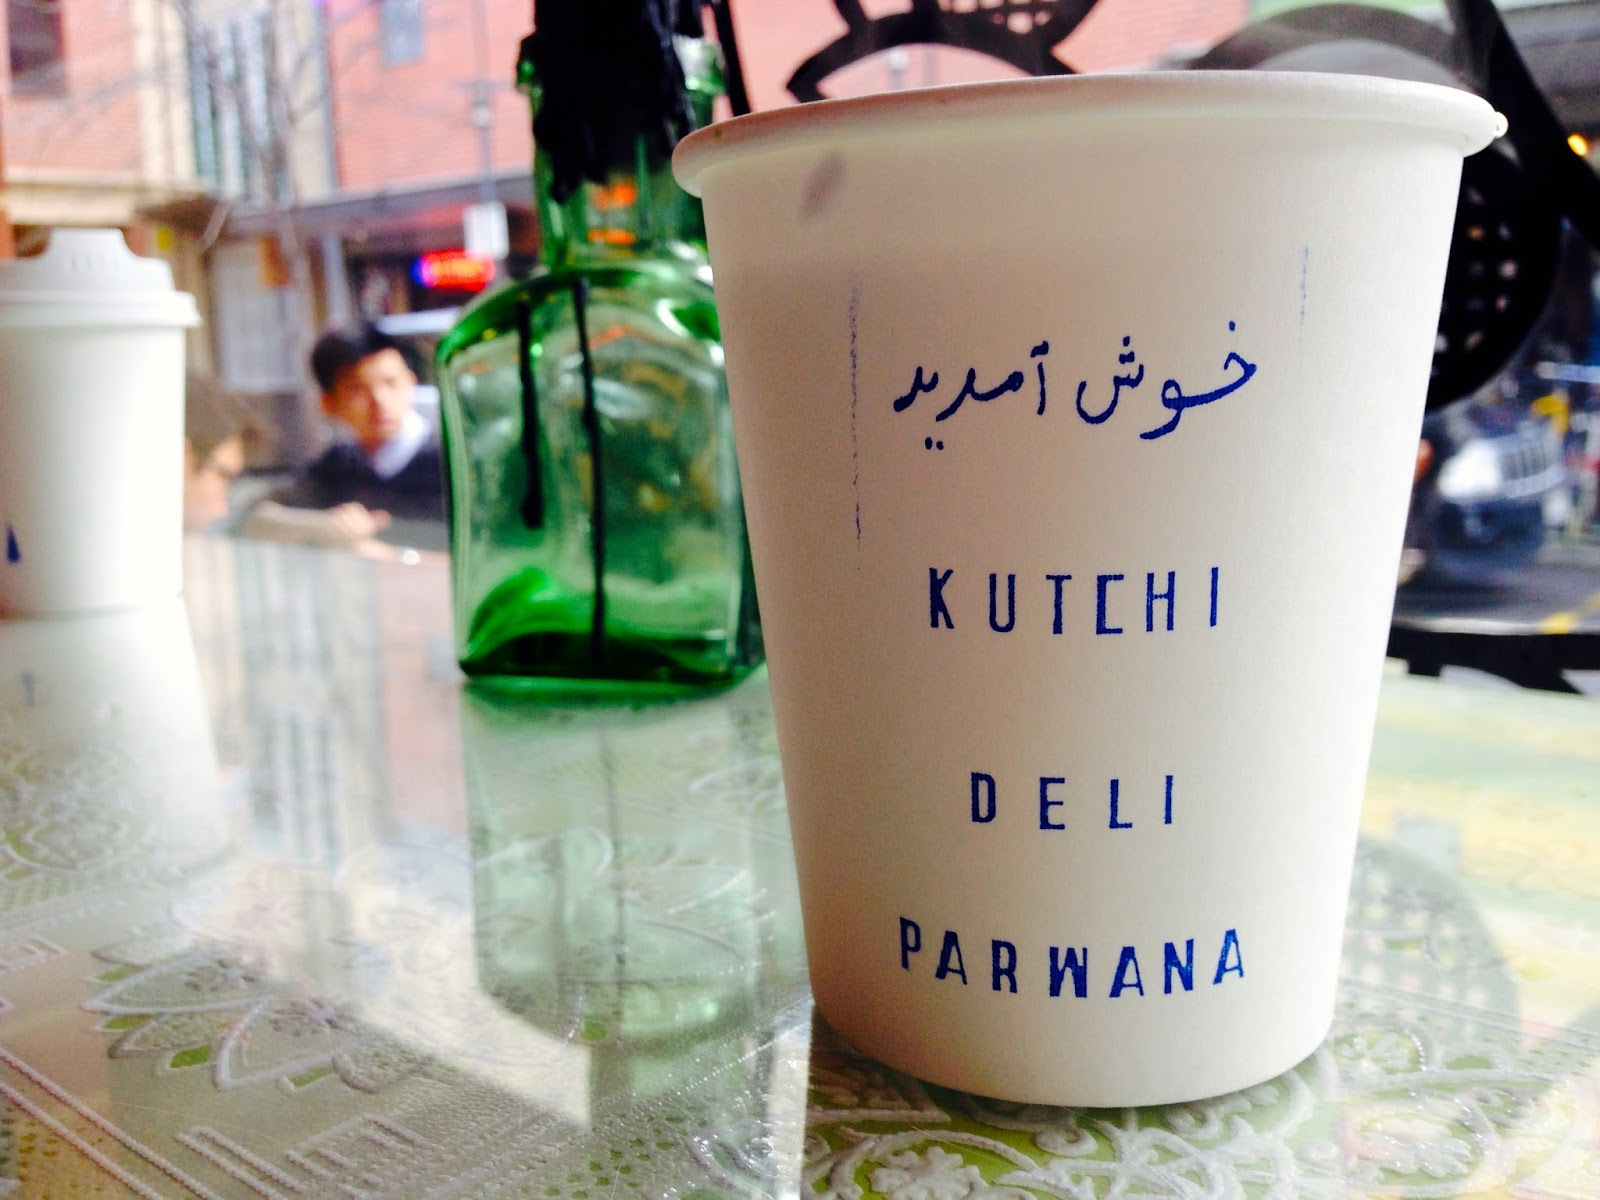 Hot spiced Afghan tea - Kutchi Deli Parwana, Adelaide